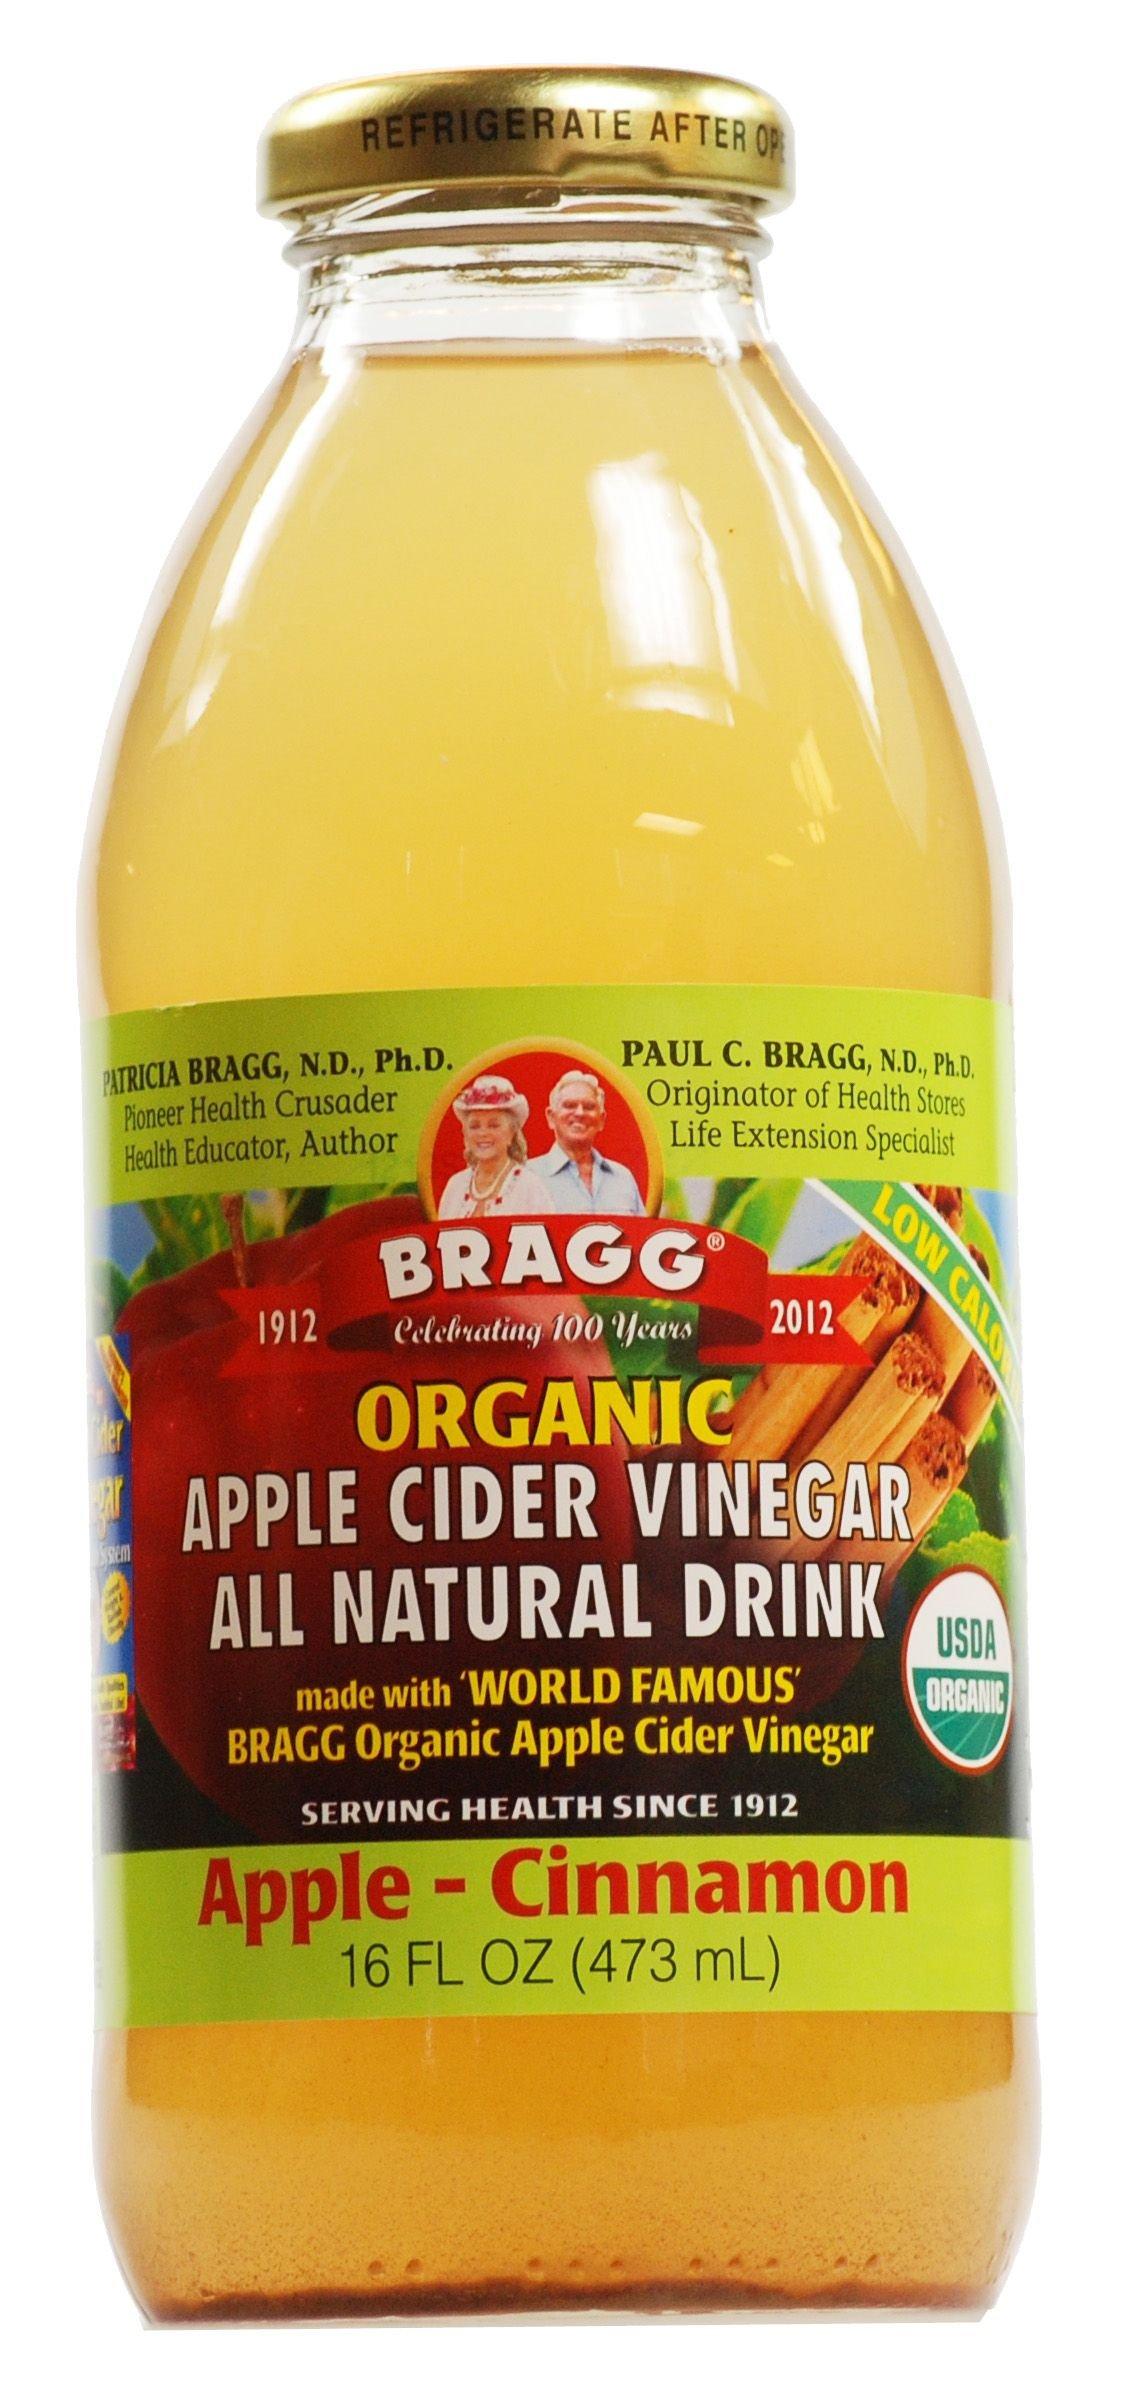 Bragg - Organic Apple Cider Vinegar All Natural Drink Apple Cinnamon - 16 oz. (Pack of 2)